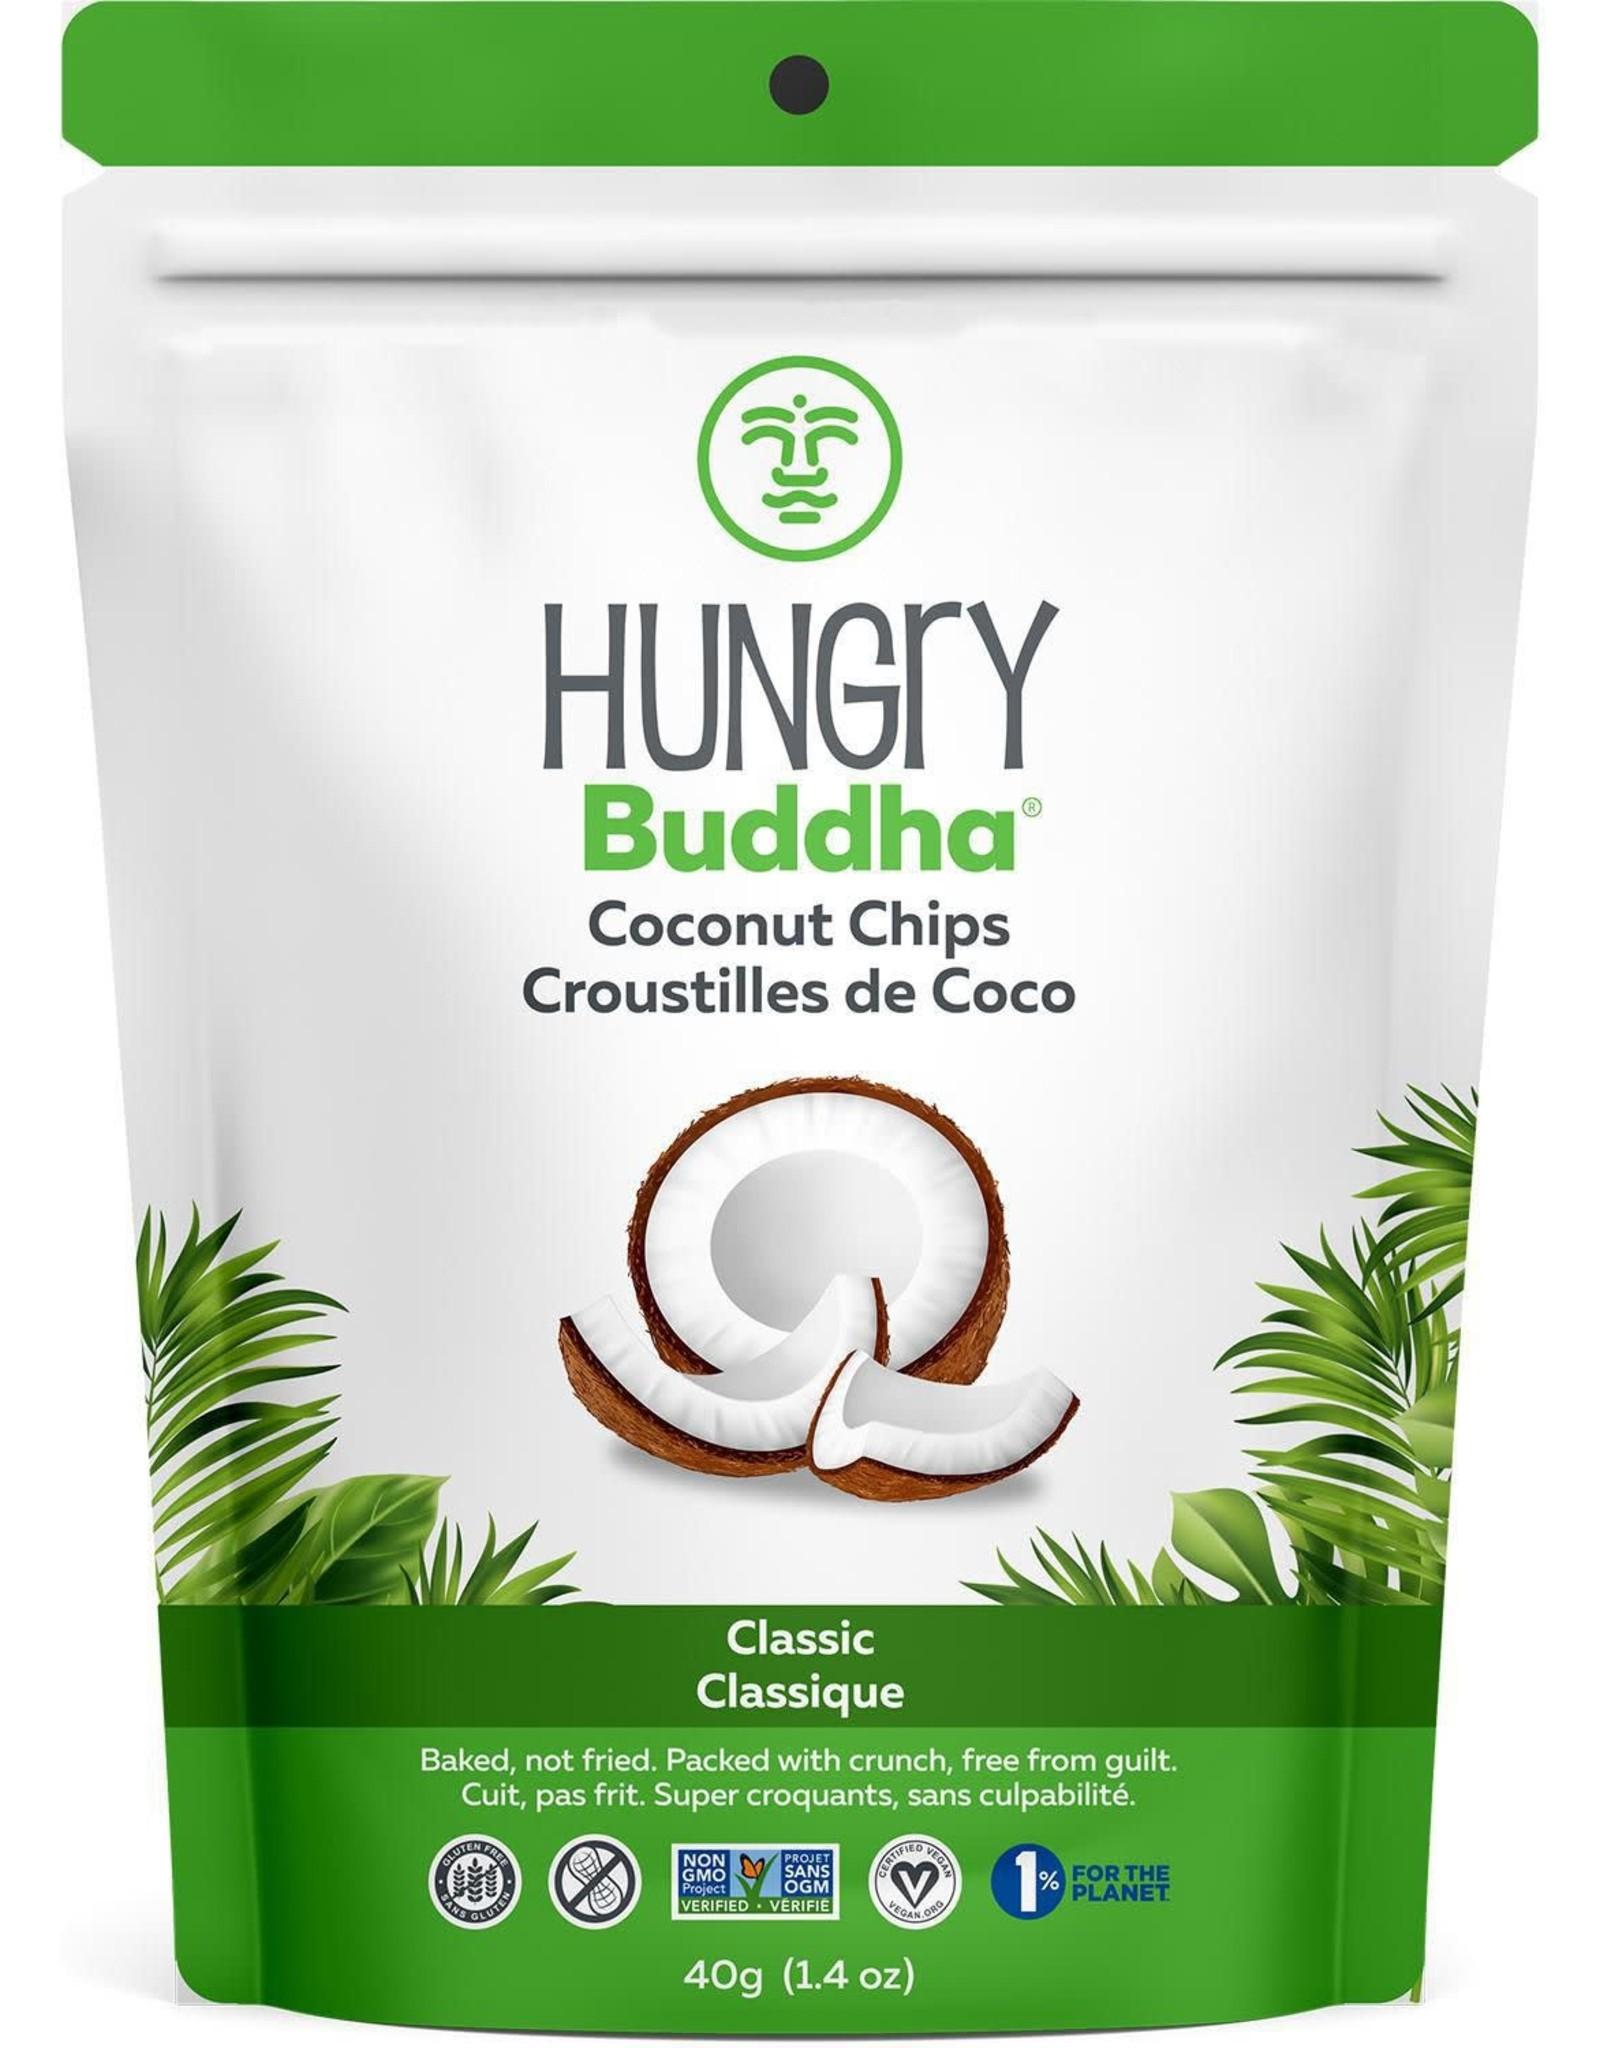 Hungry Buddha Hungry Buddha - Coconut Chips, Classic (40g)